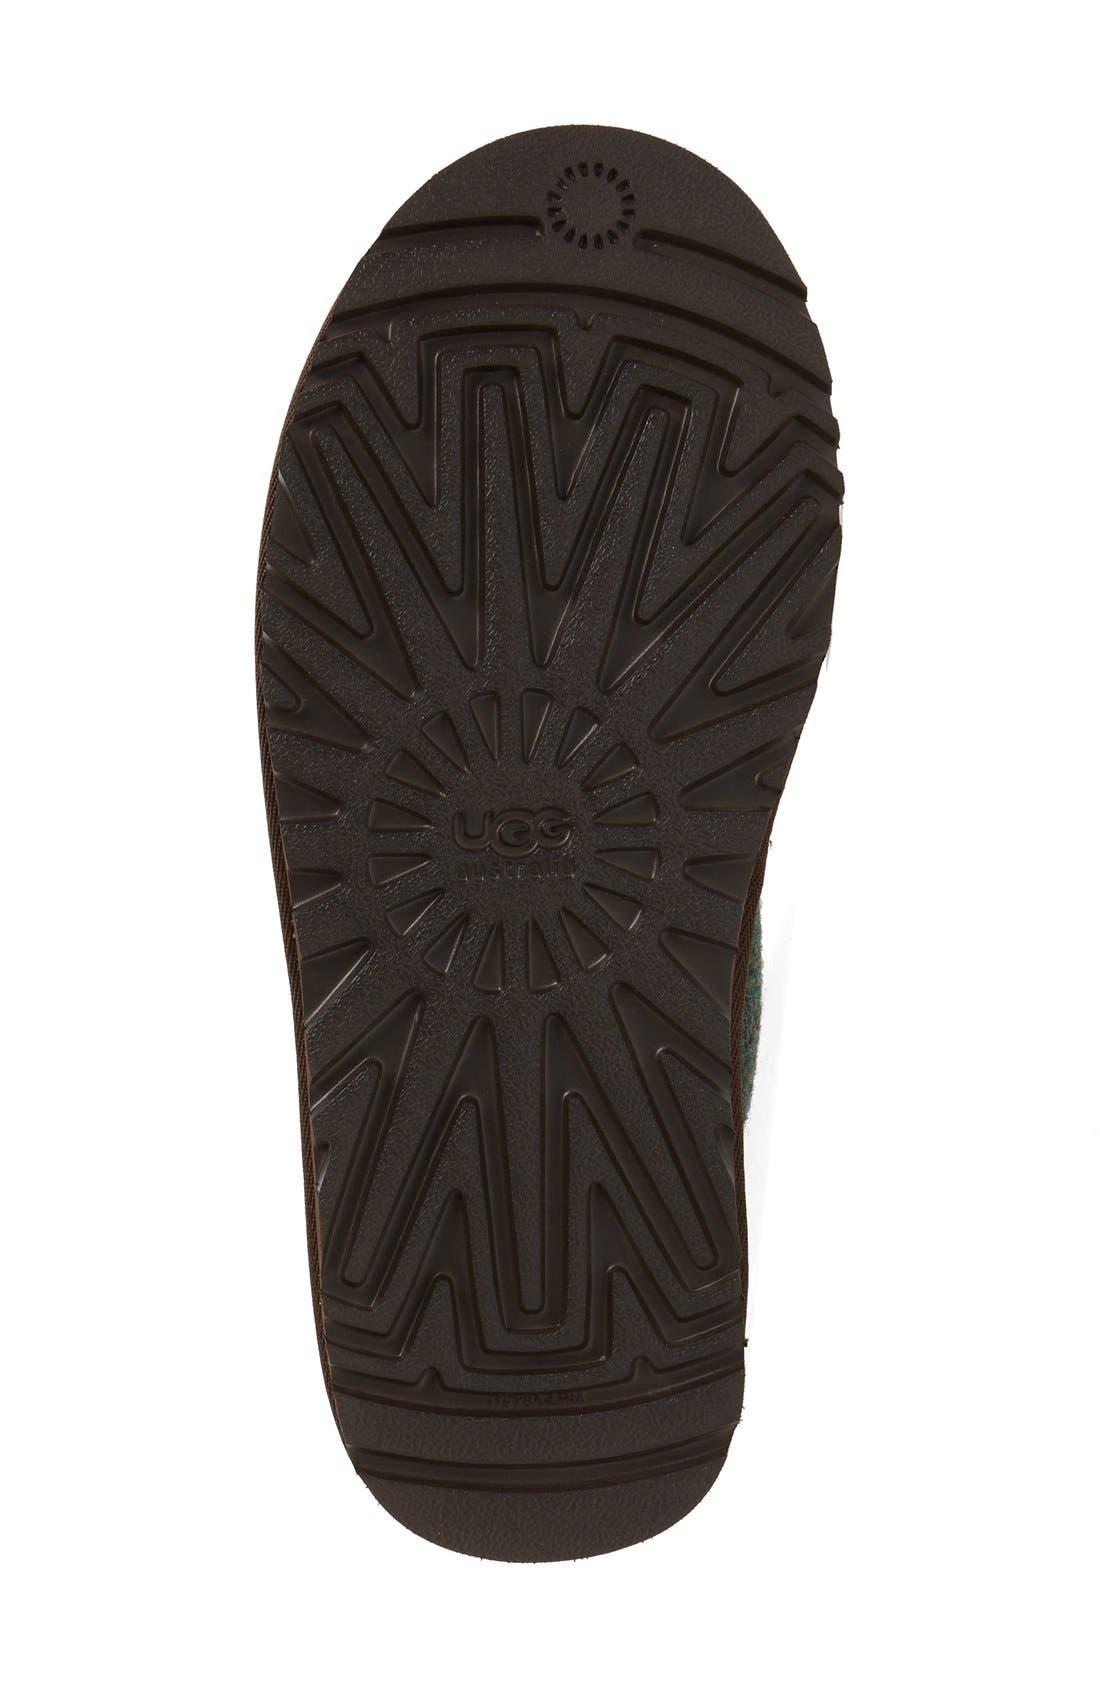 Neumel Wool & Leather Chukka Boot,                             Alternate thumbnail 4, color,                             207